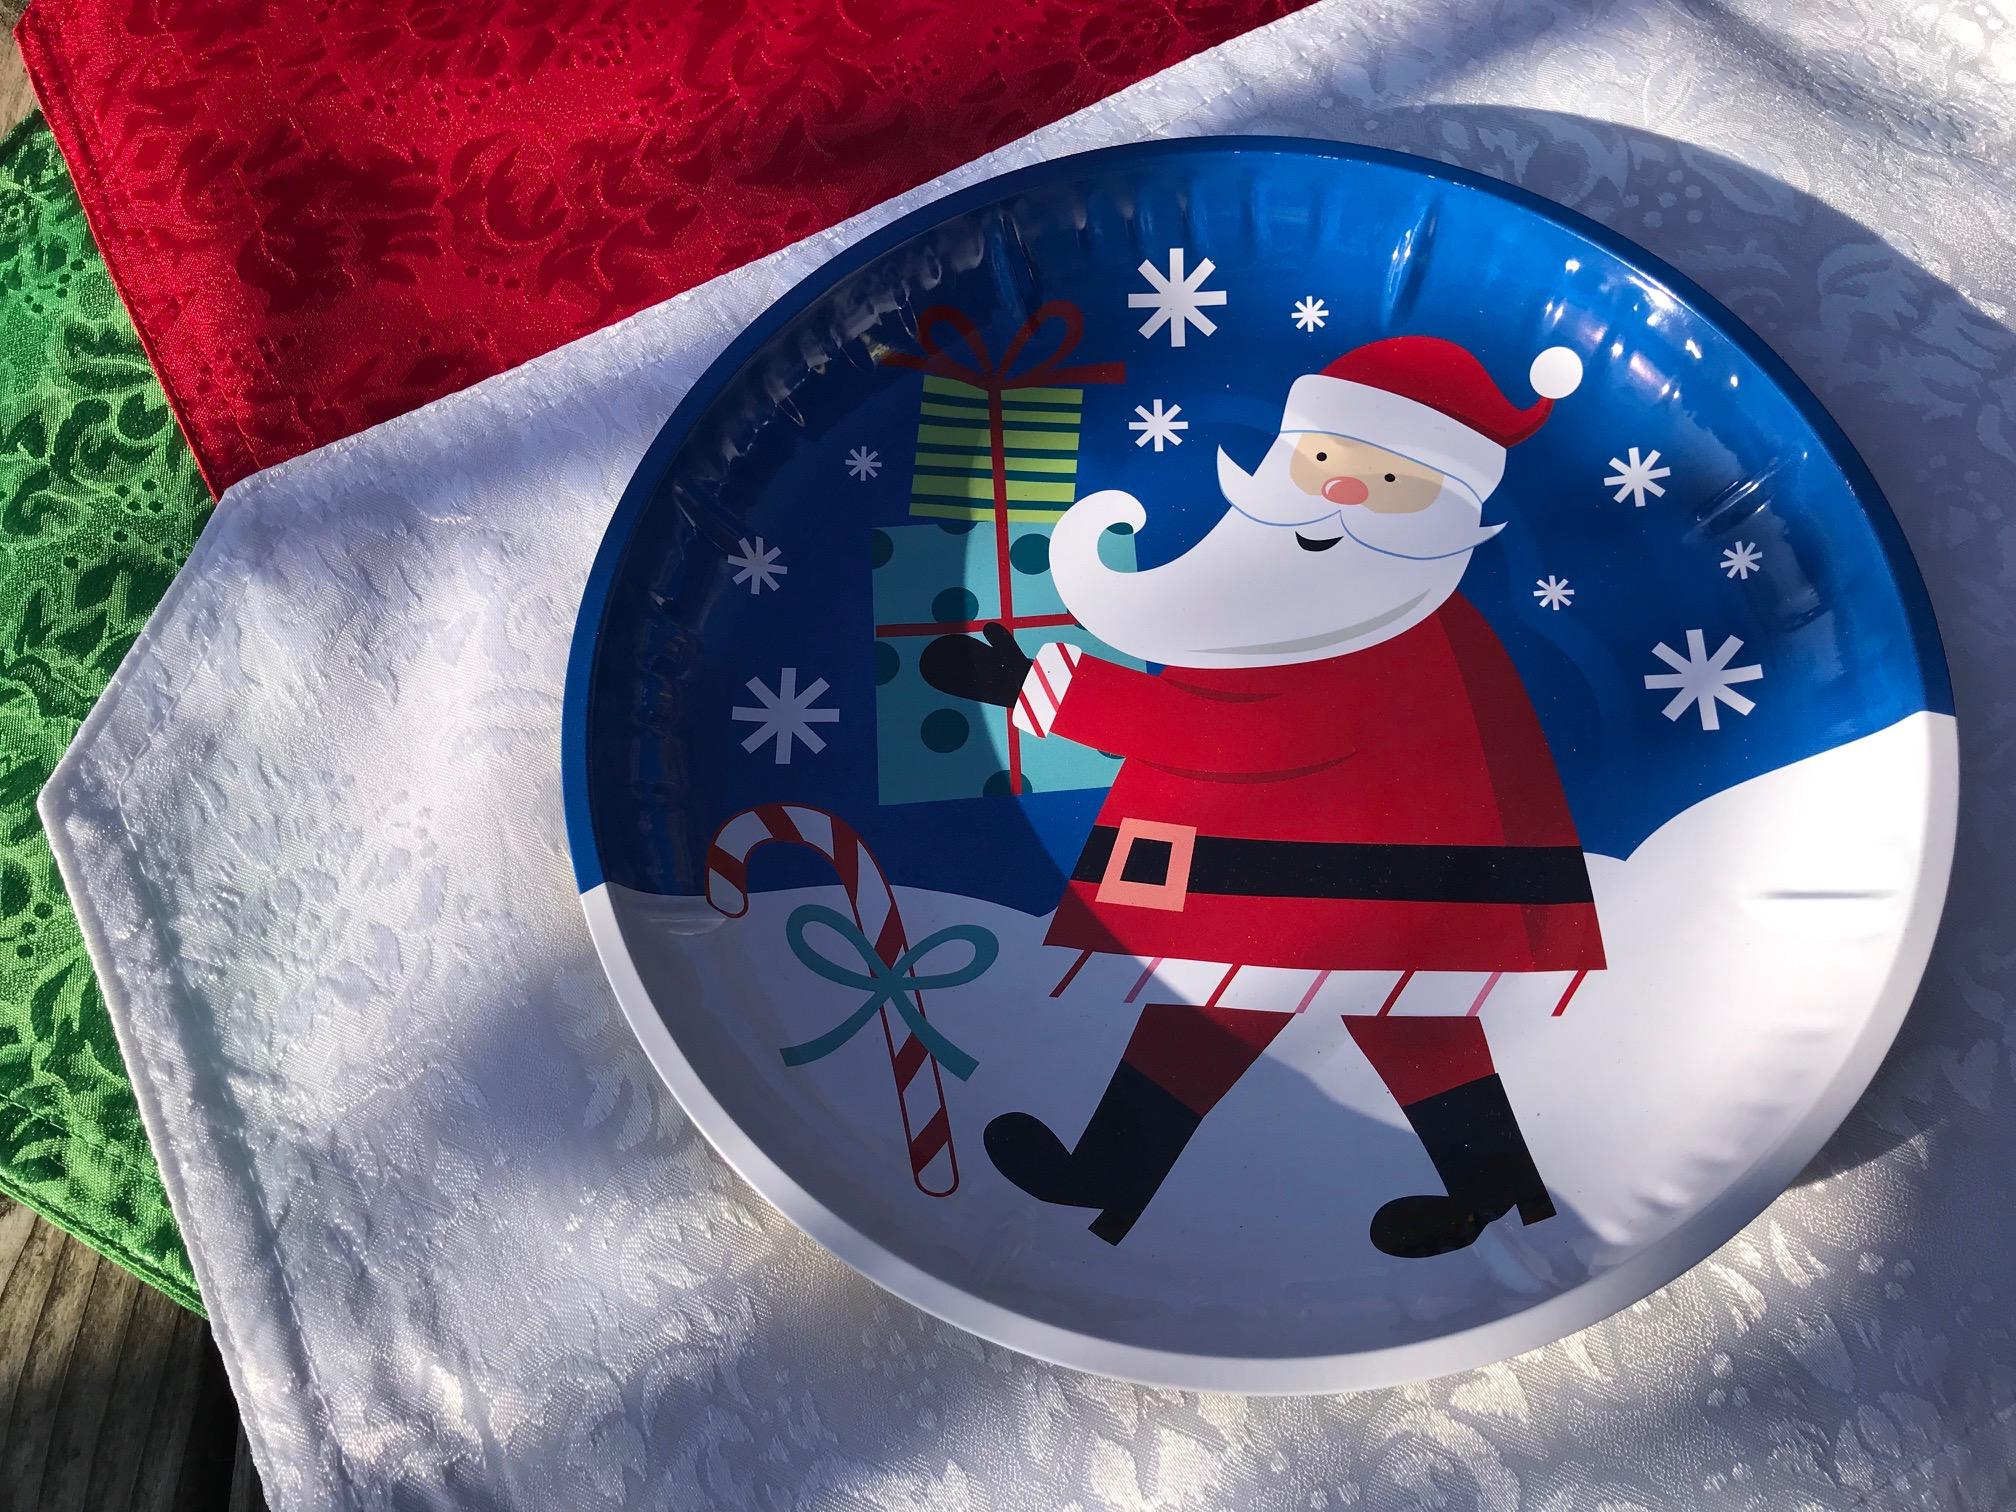 2018 Dollar Store Santa Claus Design Metal Tray / Plate: Lead Free!